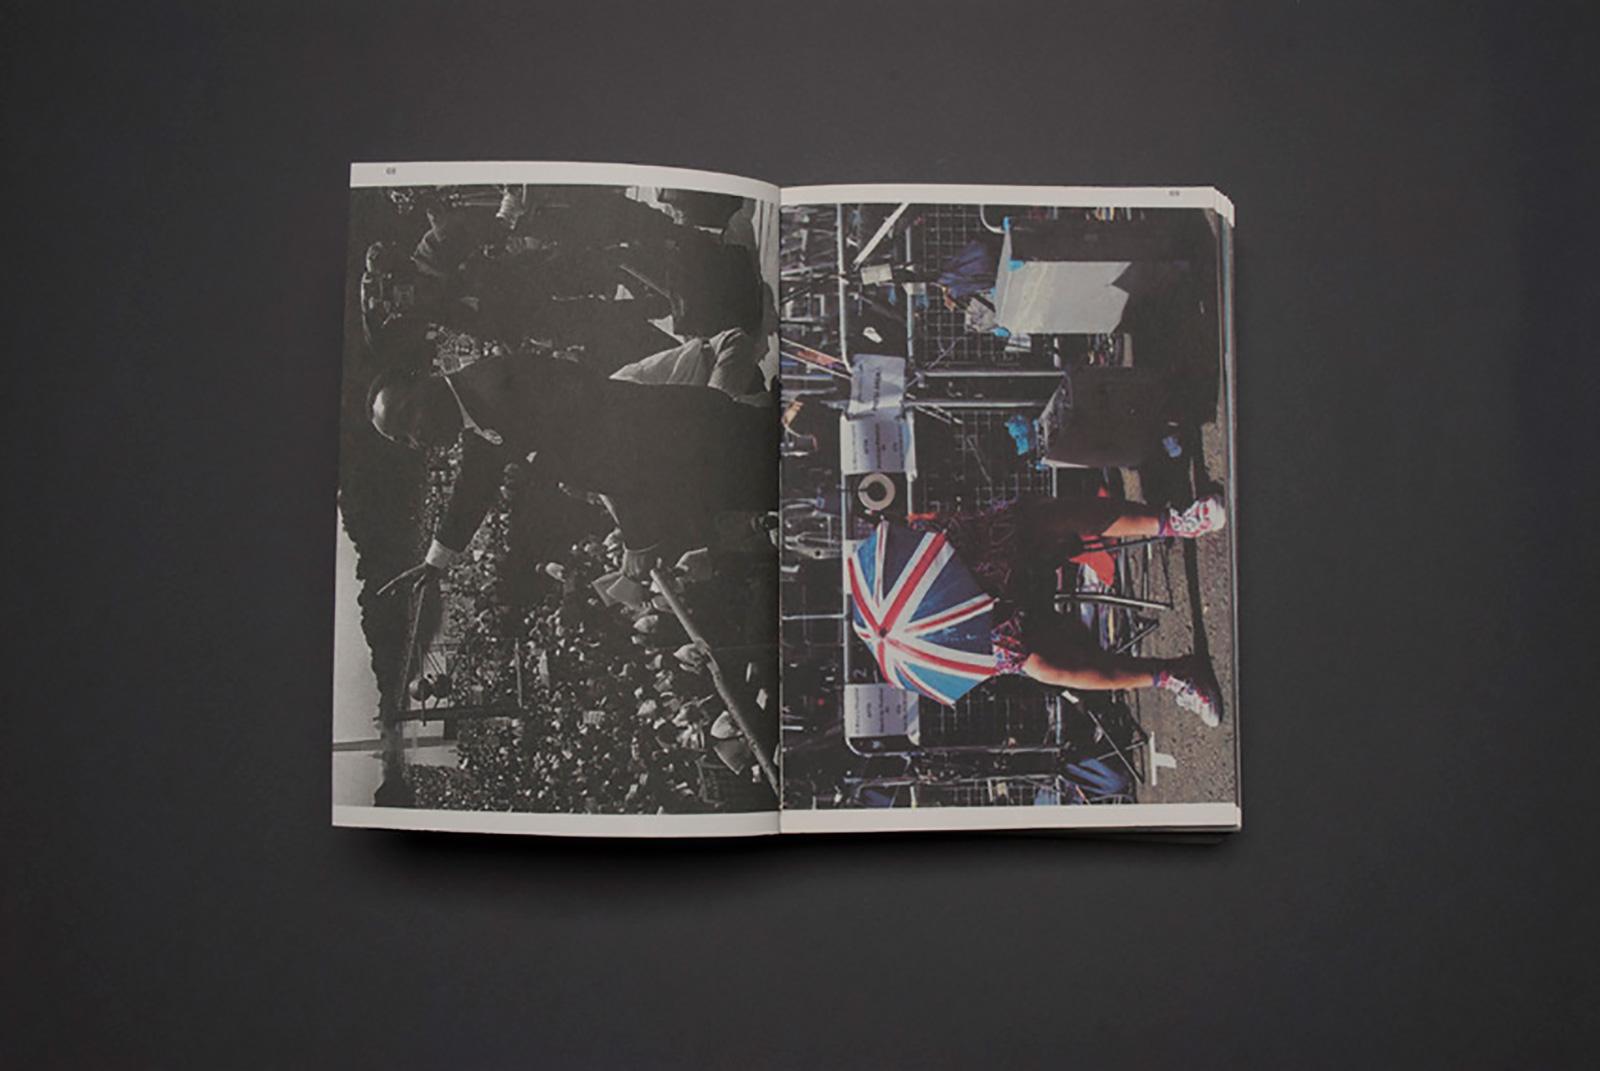 whats-inside-the-koffer-book-wilco-monen-06.jpg